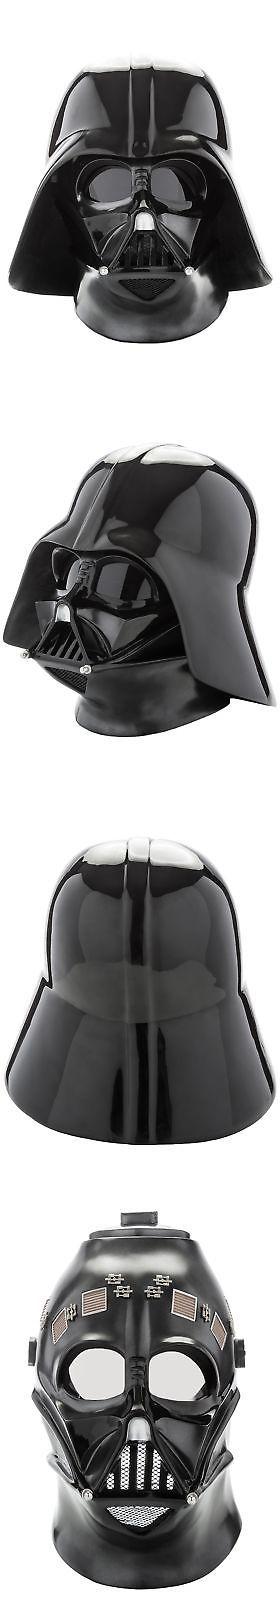 Masks and Eye Masks 116724: Star Wars Darth Vader Collector S Helmet -> BUY IT NOW ONLY: $554.98 on eBay!